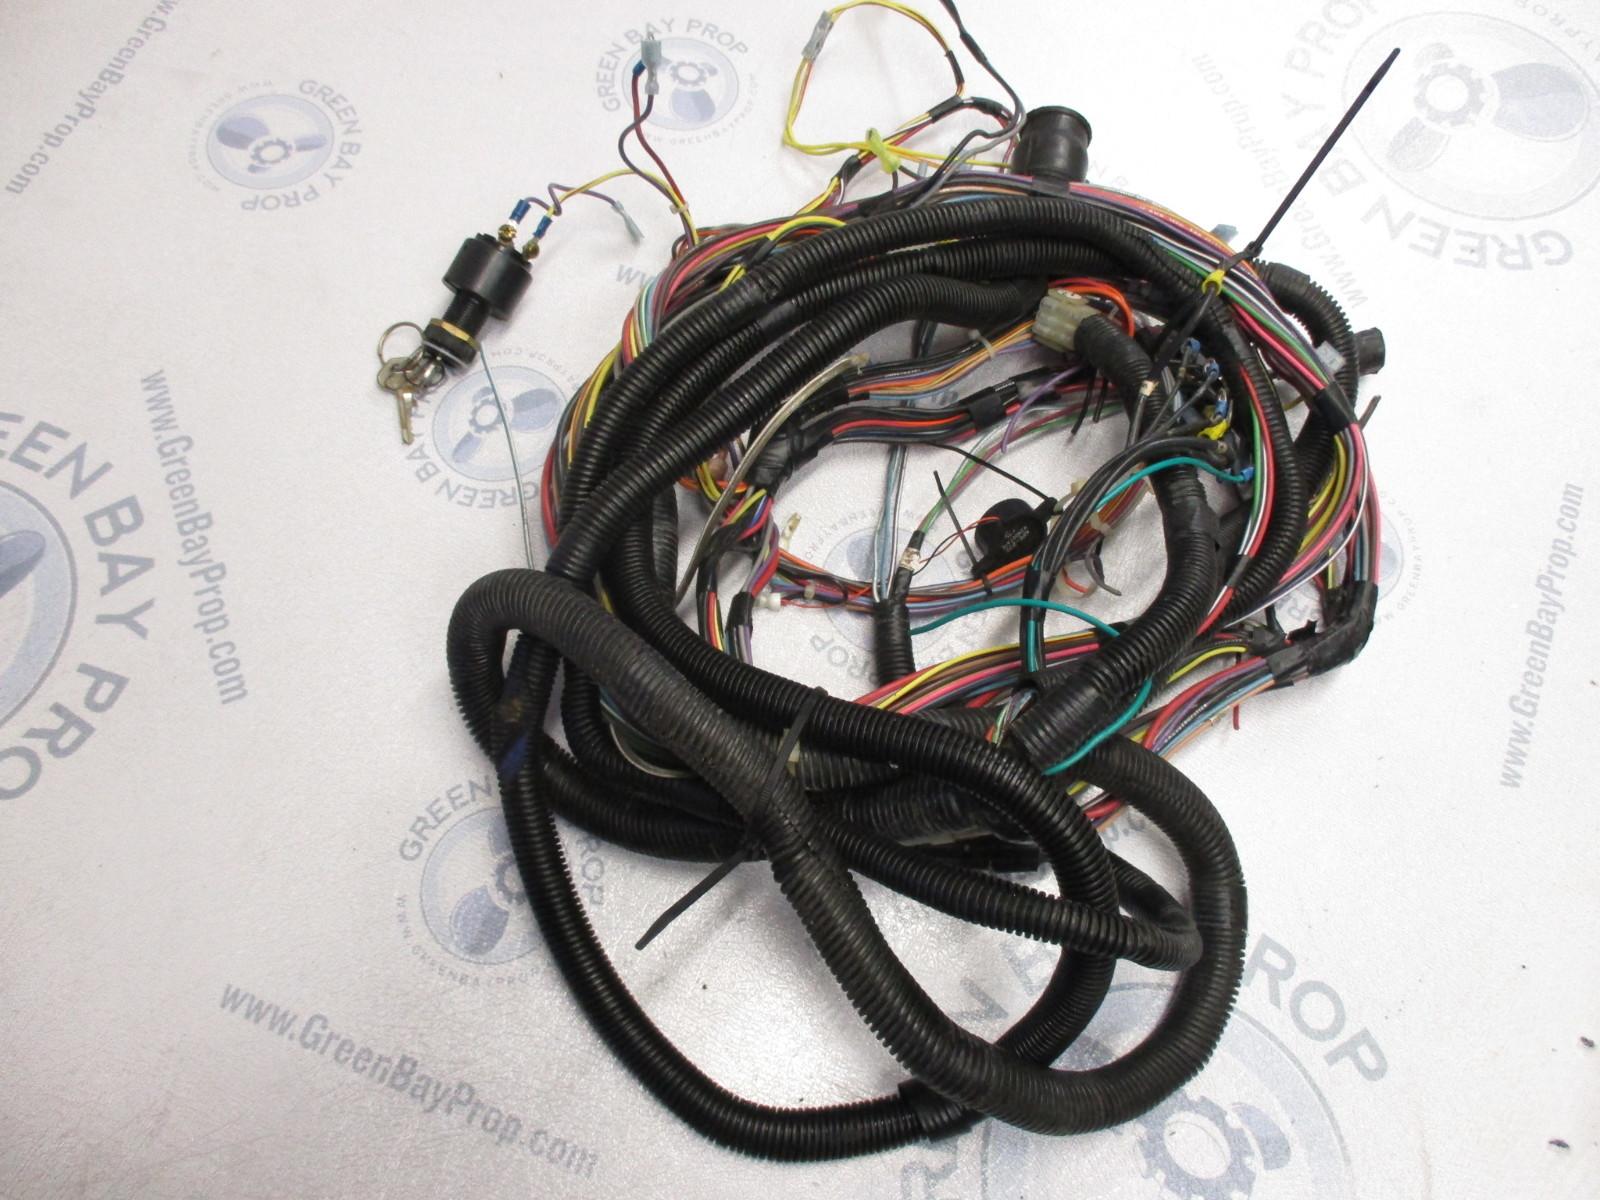 Sx Px332m Technics Pedal Wiring Ktm 520 Diagram